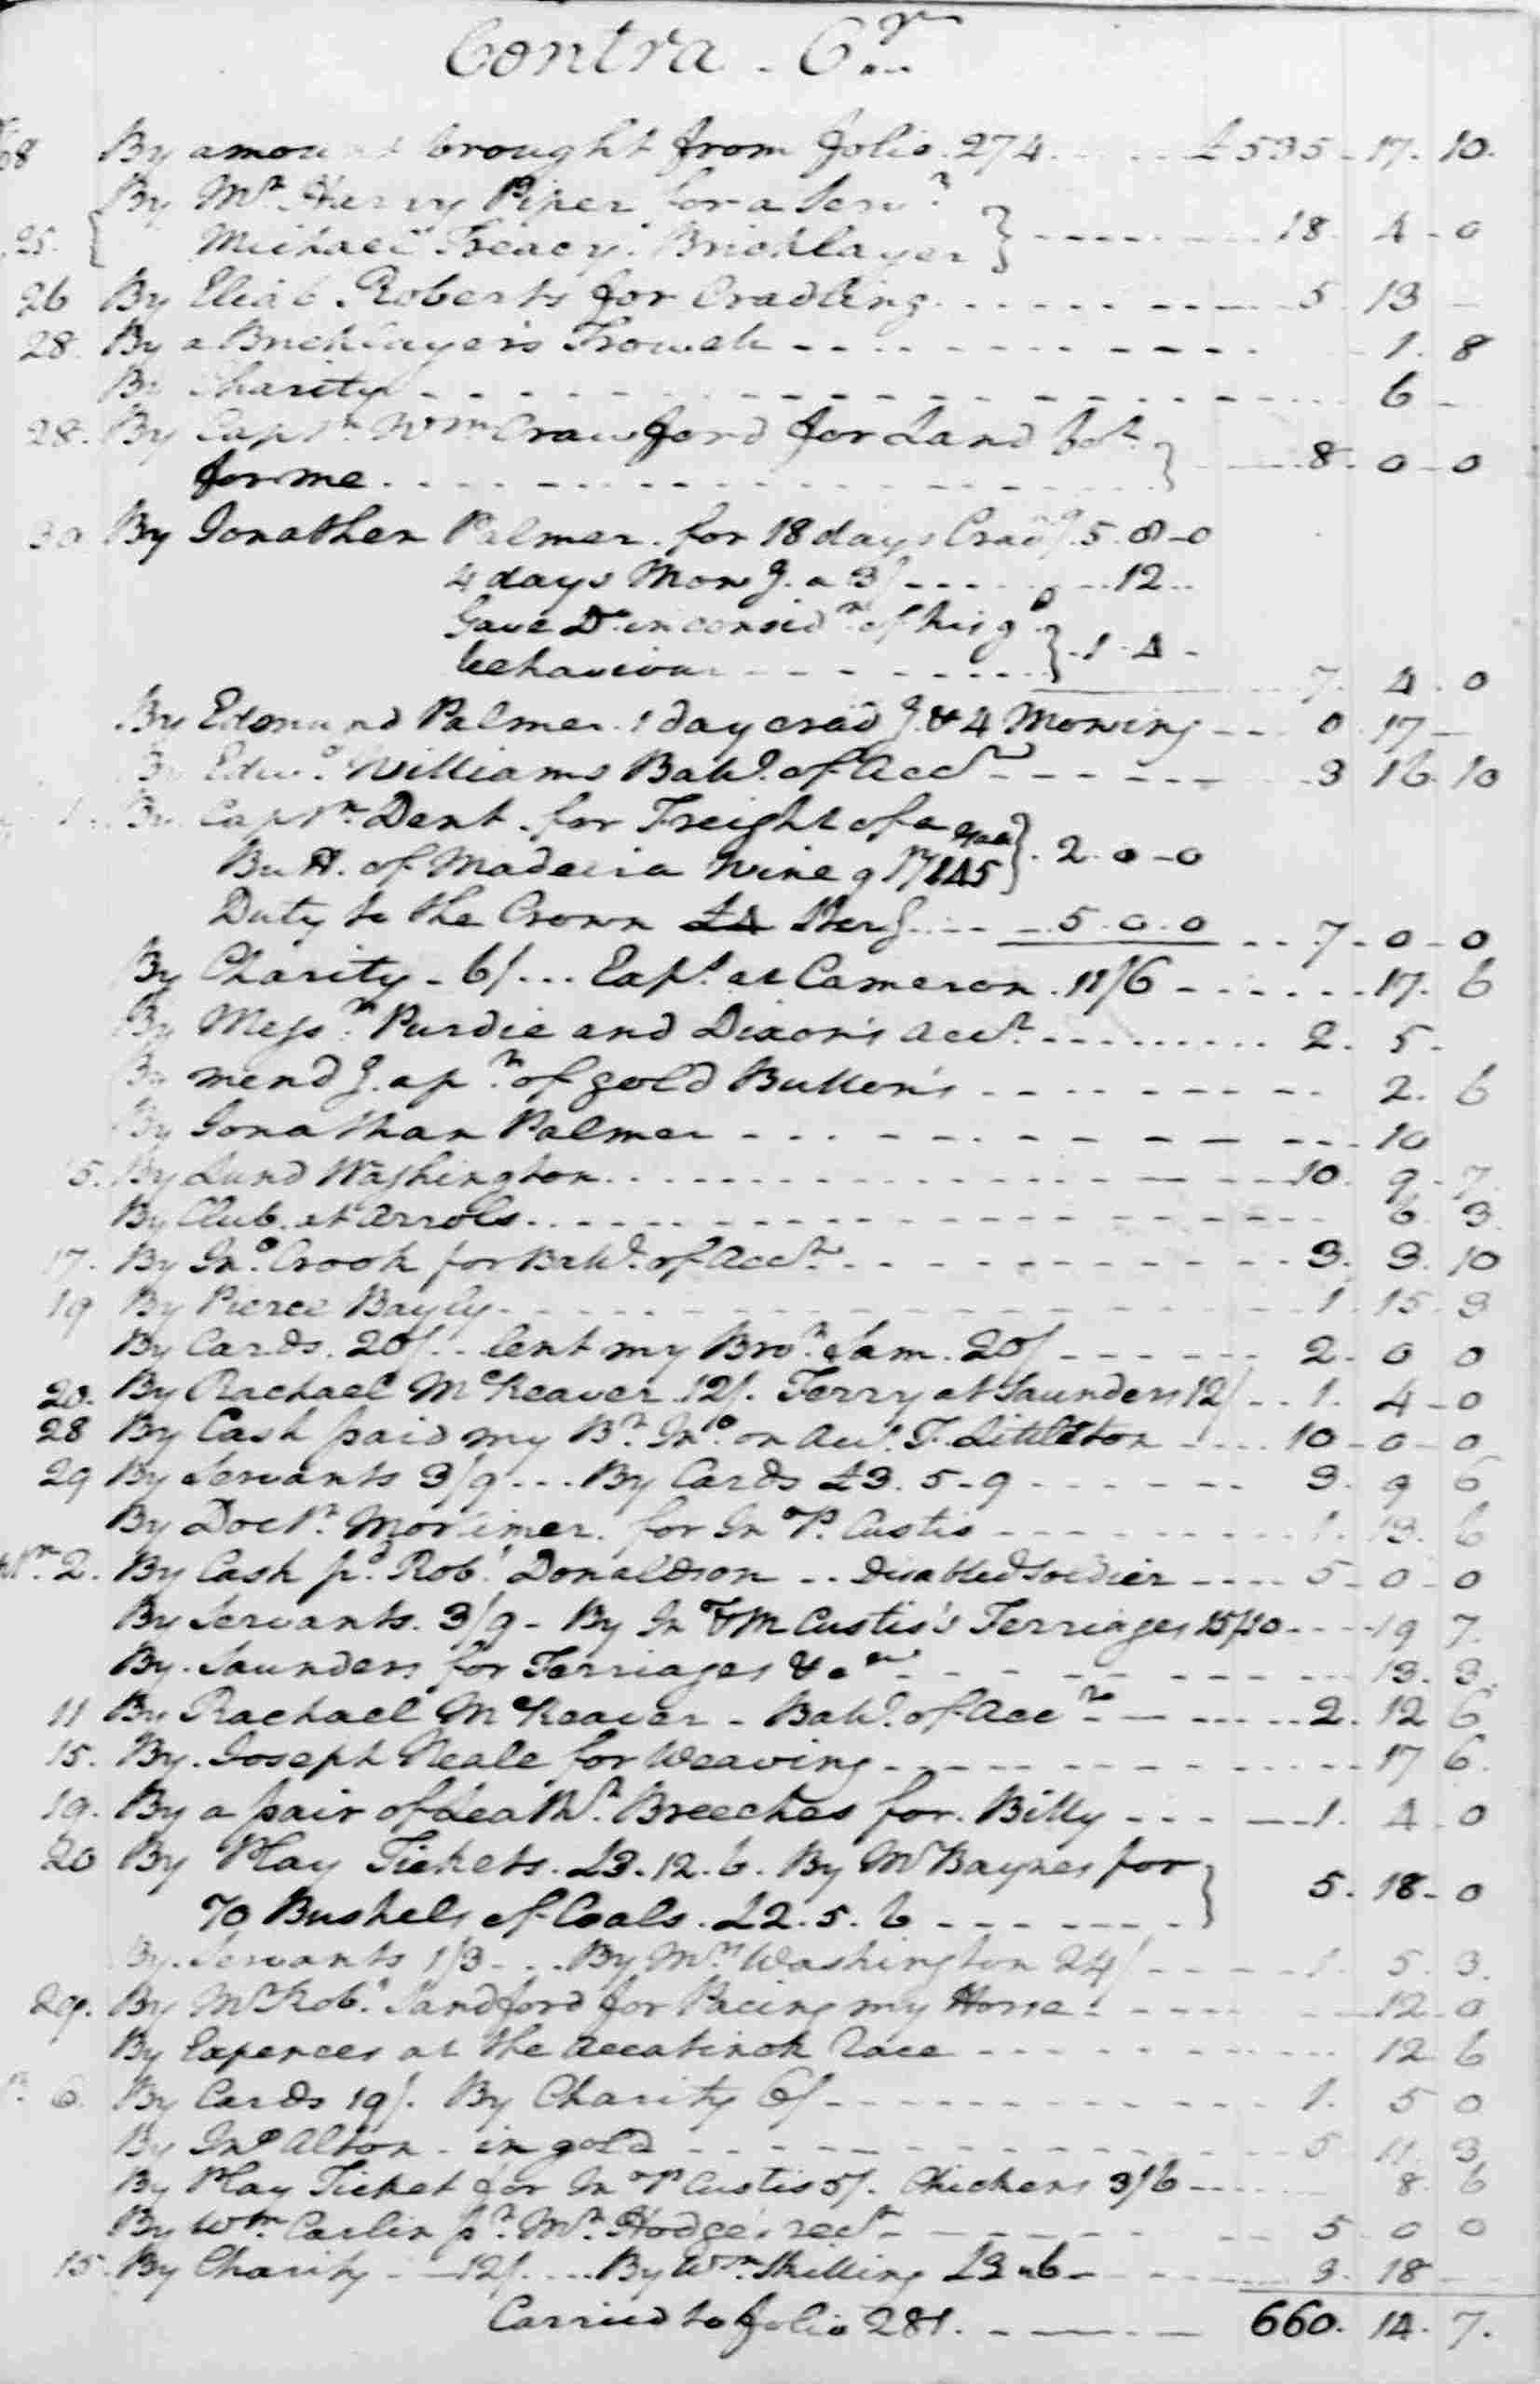 Ledger A, folio 277, right side